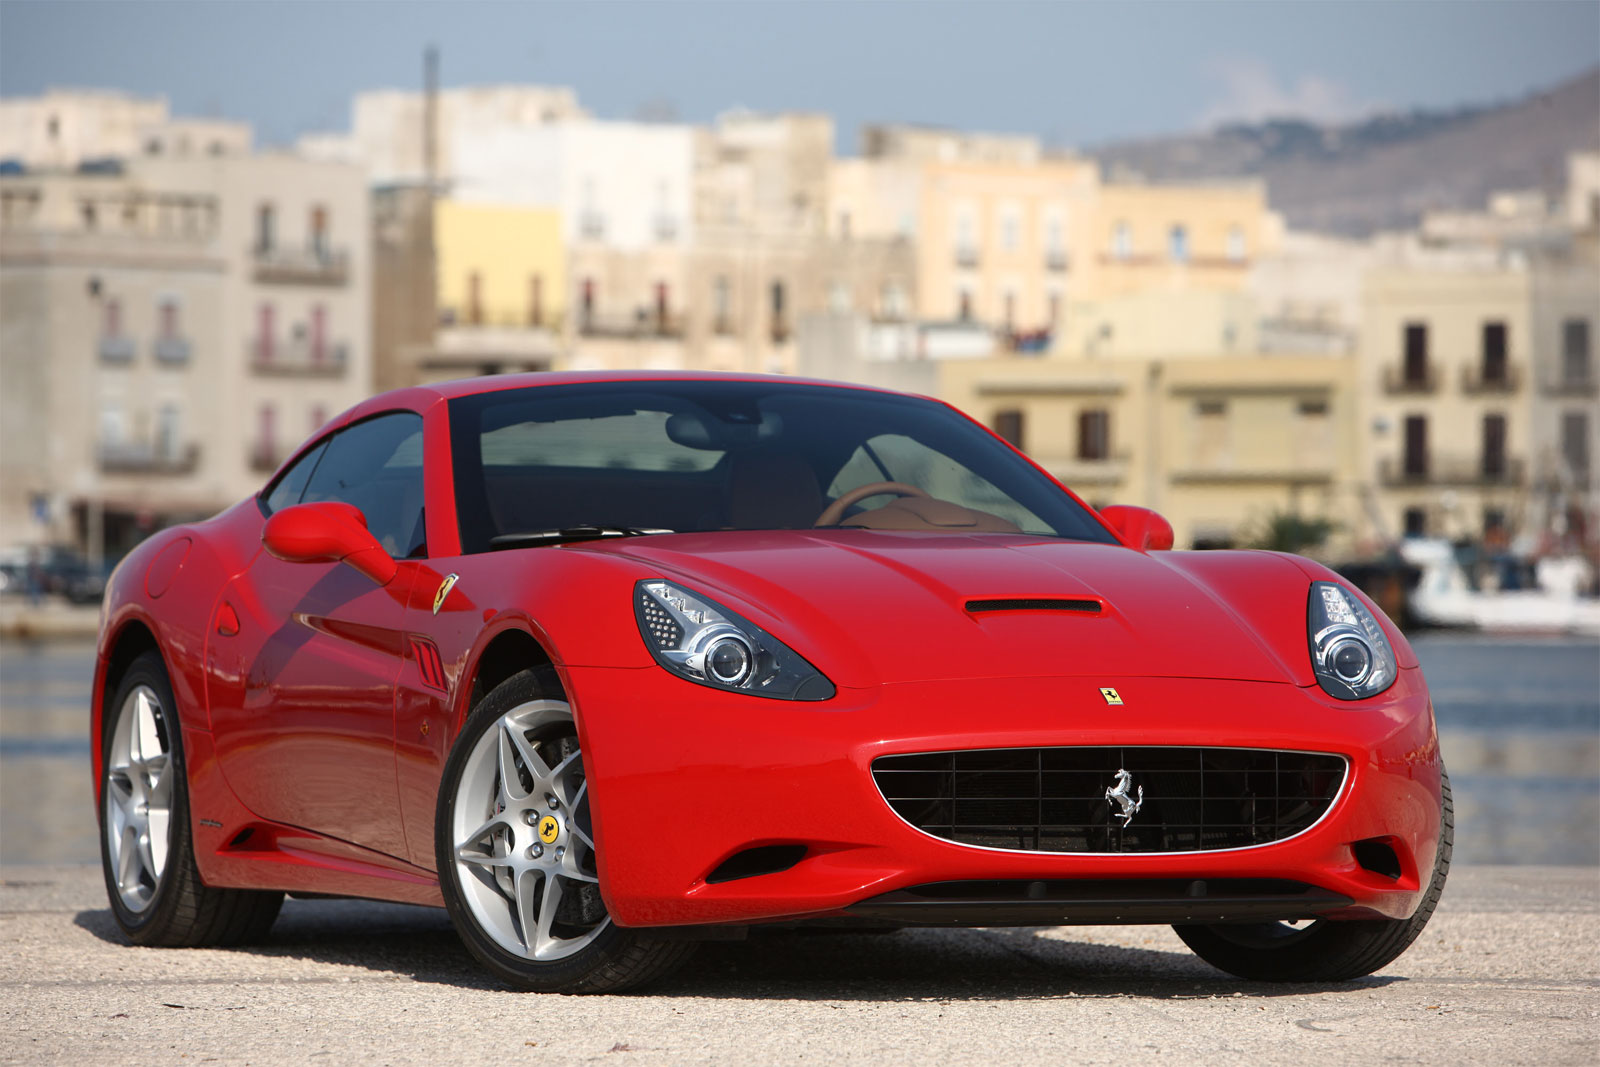 Sports Car Collection: 2011 Ferrari California Photo Gallery Ferrari Sports  Cars Wallpapers 2011